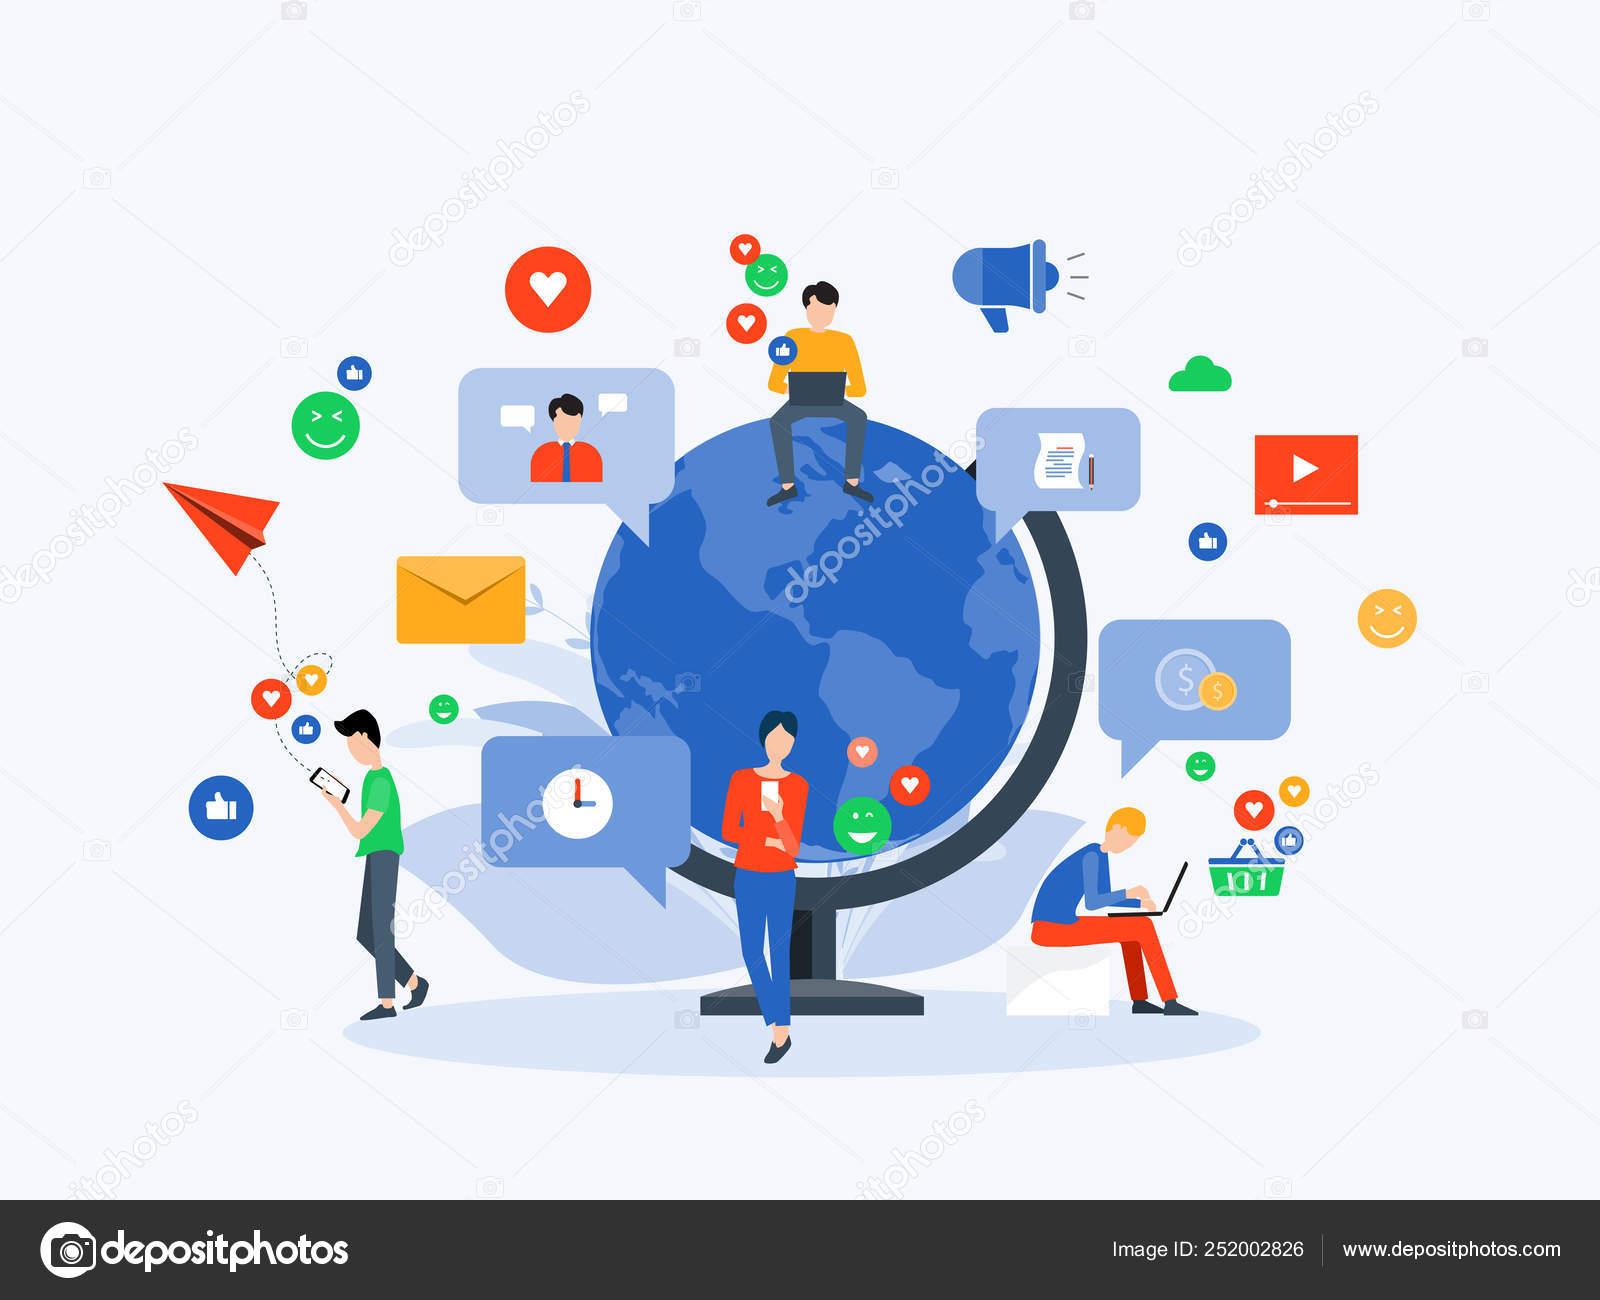 flat vector illustration social media digital marketing online connection concept stock vector c tcdesign 252002826 flat vector illustration social media digital marketing online connection concept stock vector c tcdesign 252002826